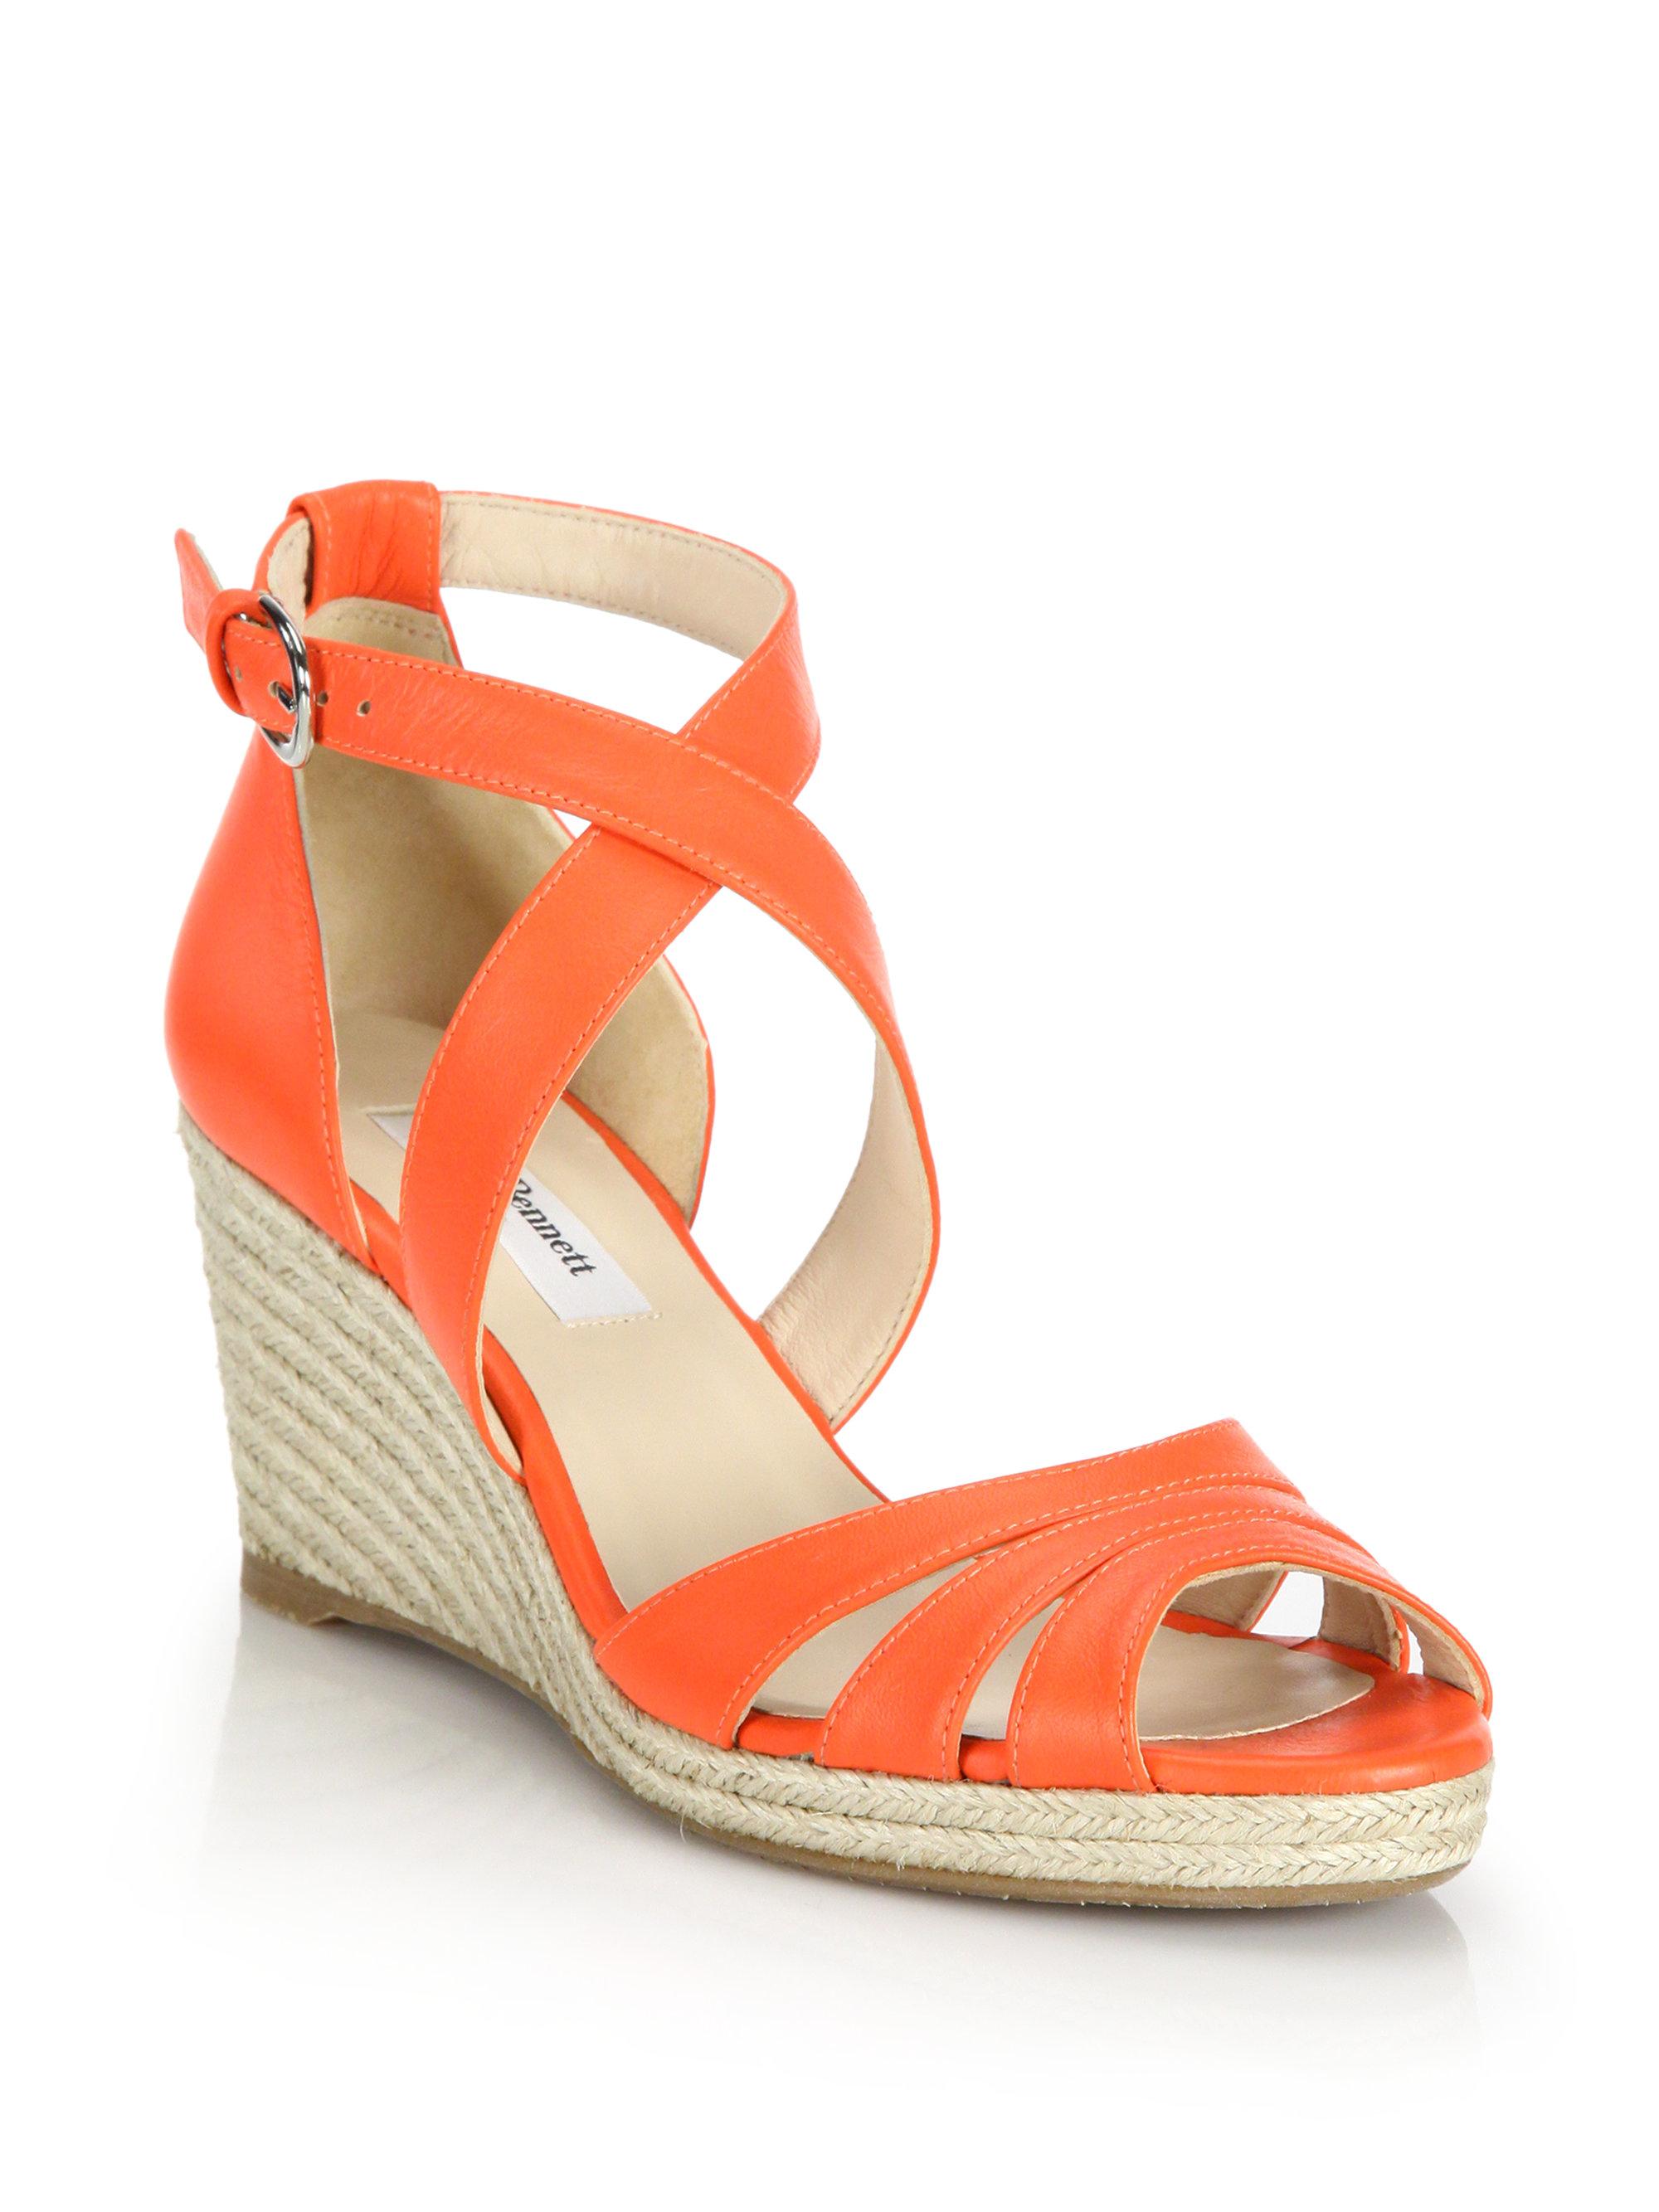 318a1180a3d L.K.Bennett Orange Priya Leather Espadrille Wedge Sandals